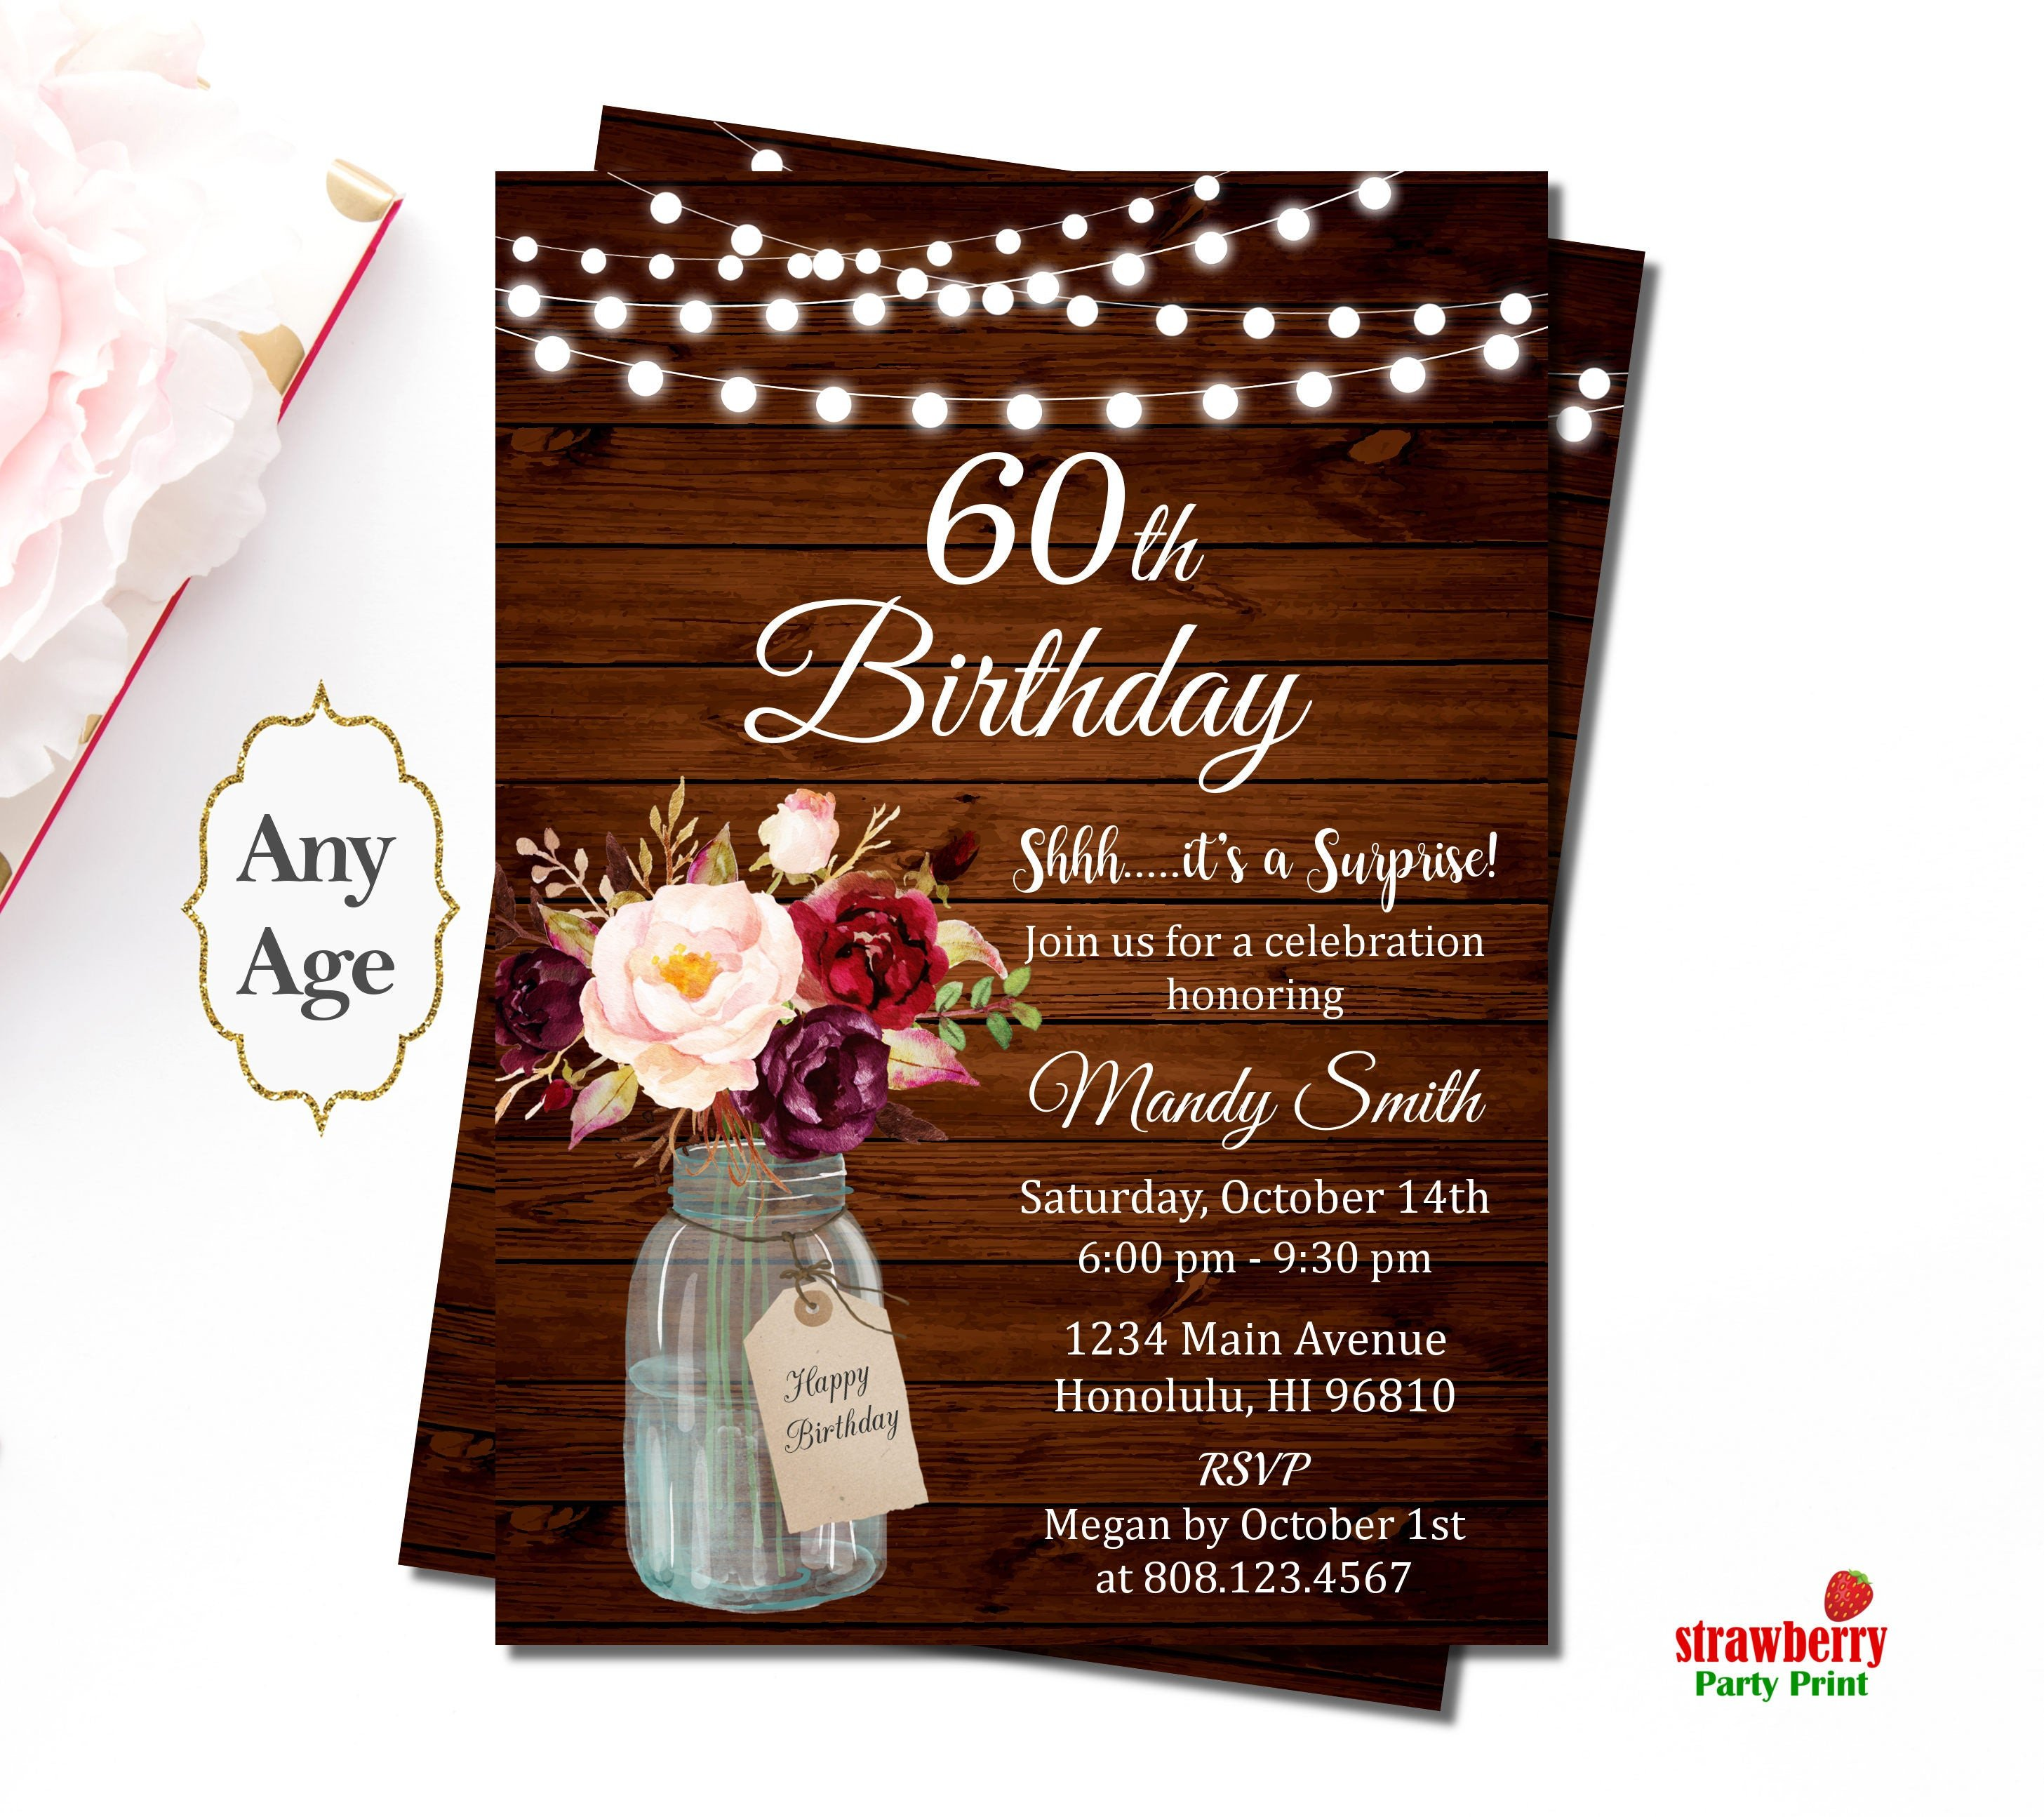 60 Th Birthday Invitation 60th Birthday Invitations for Women Surprise 60th Birthday